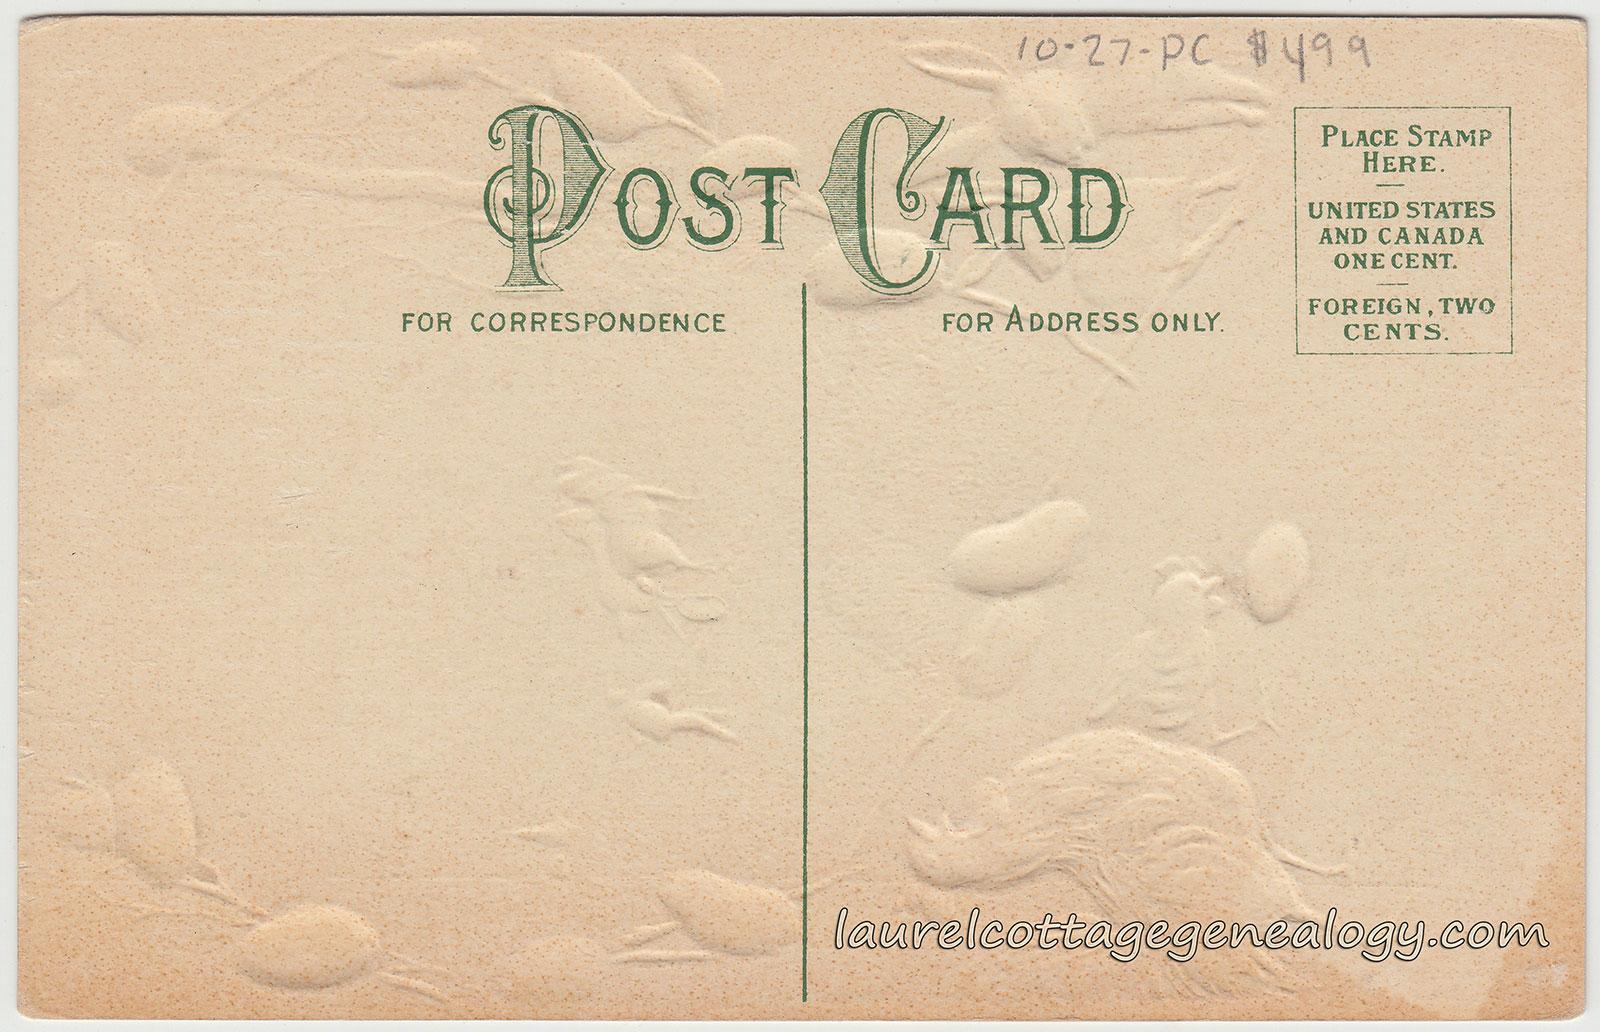 antique and vintage Easter postcards – Easter Postcard Template